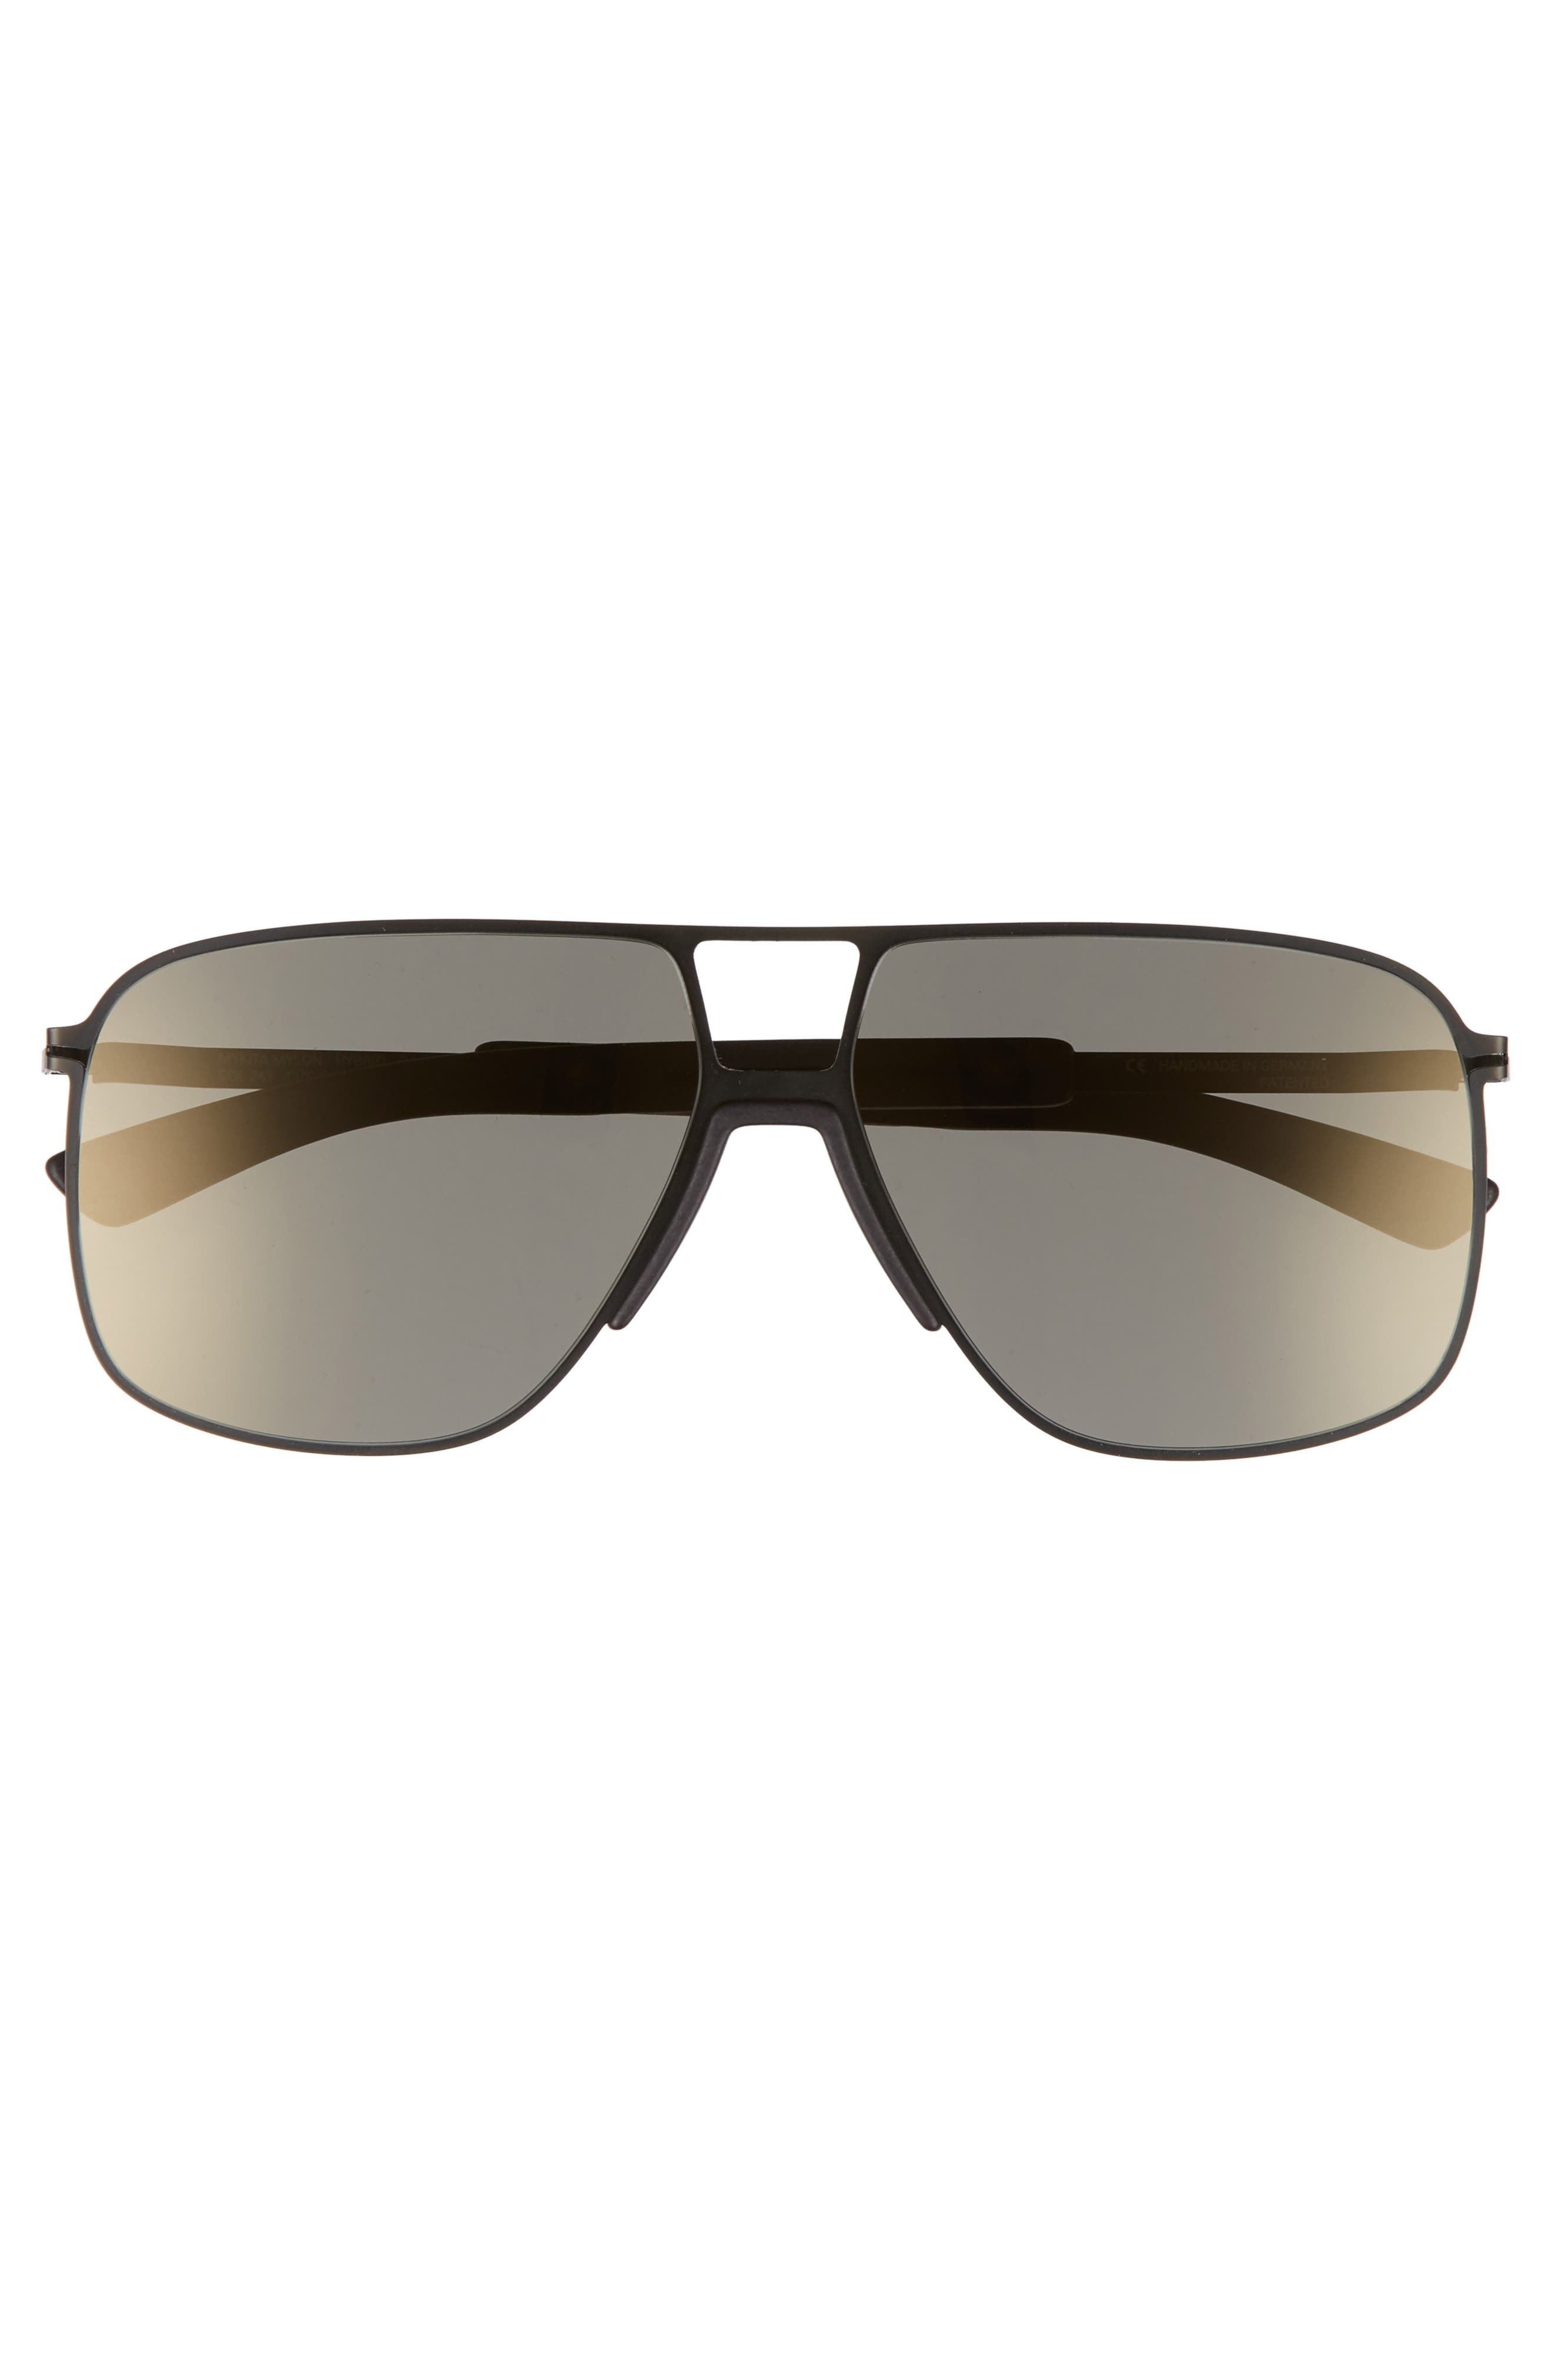 Oak 61mm Aviator Sunglasses,                             Alternate thumbnail 3, color,